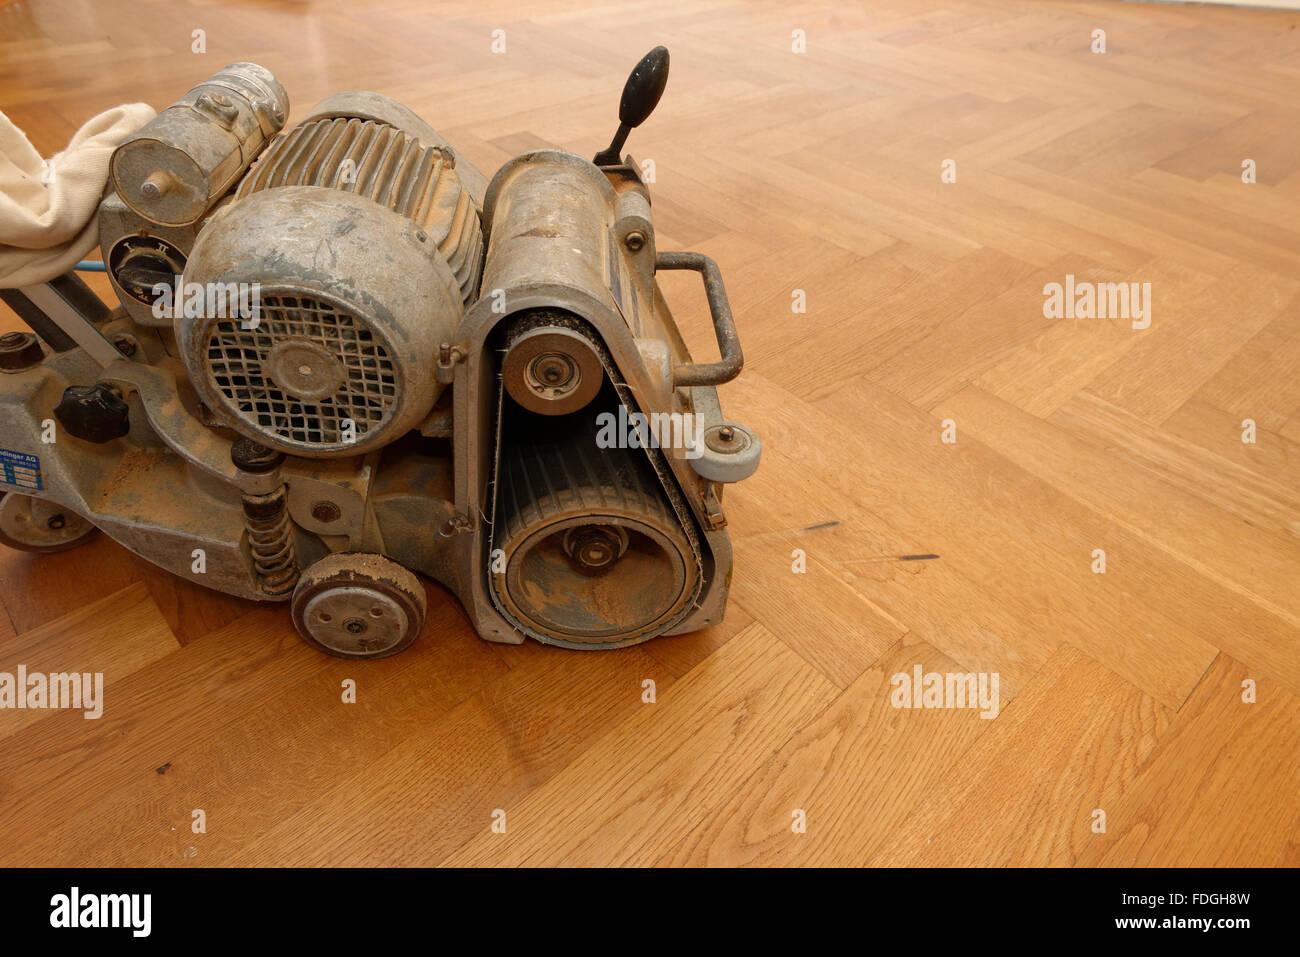 A grinding machine for wooden parquet floors on a oak parquet. - Stock Image